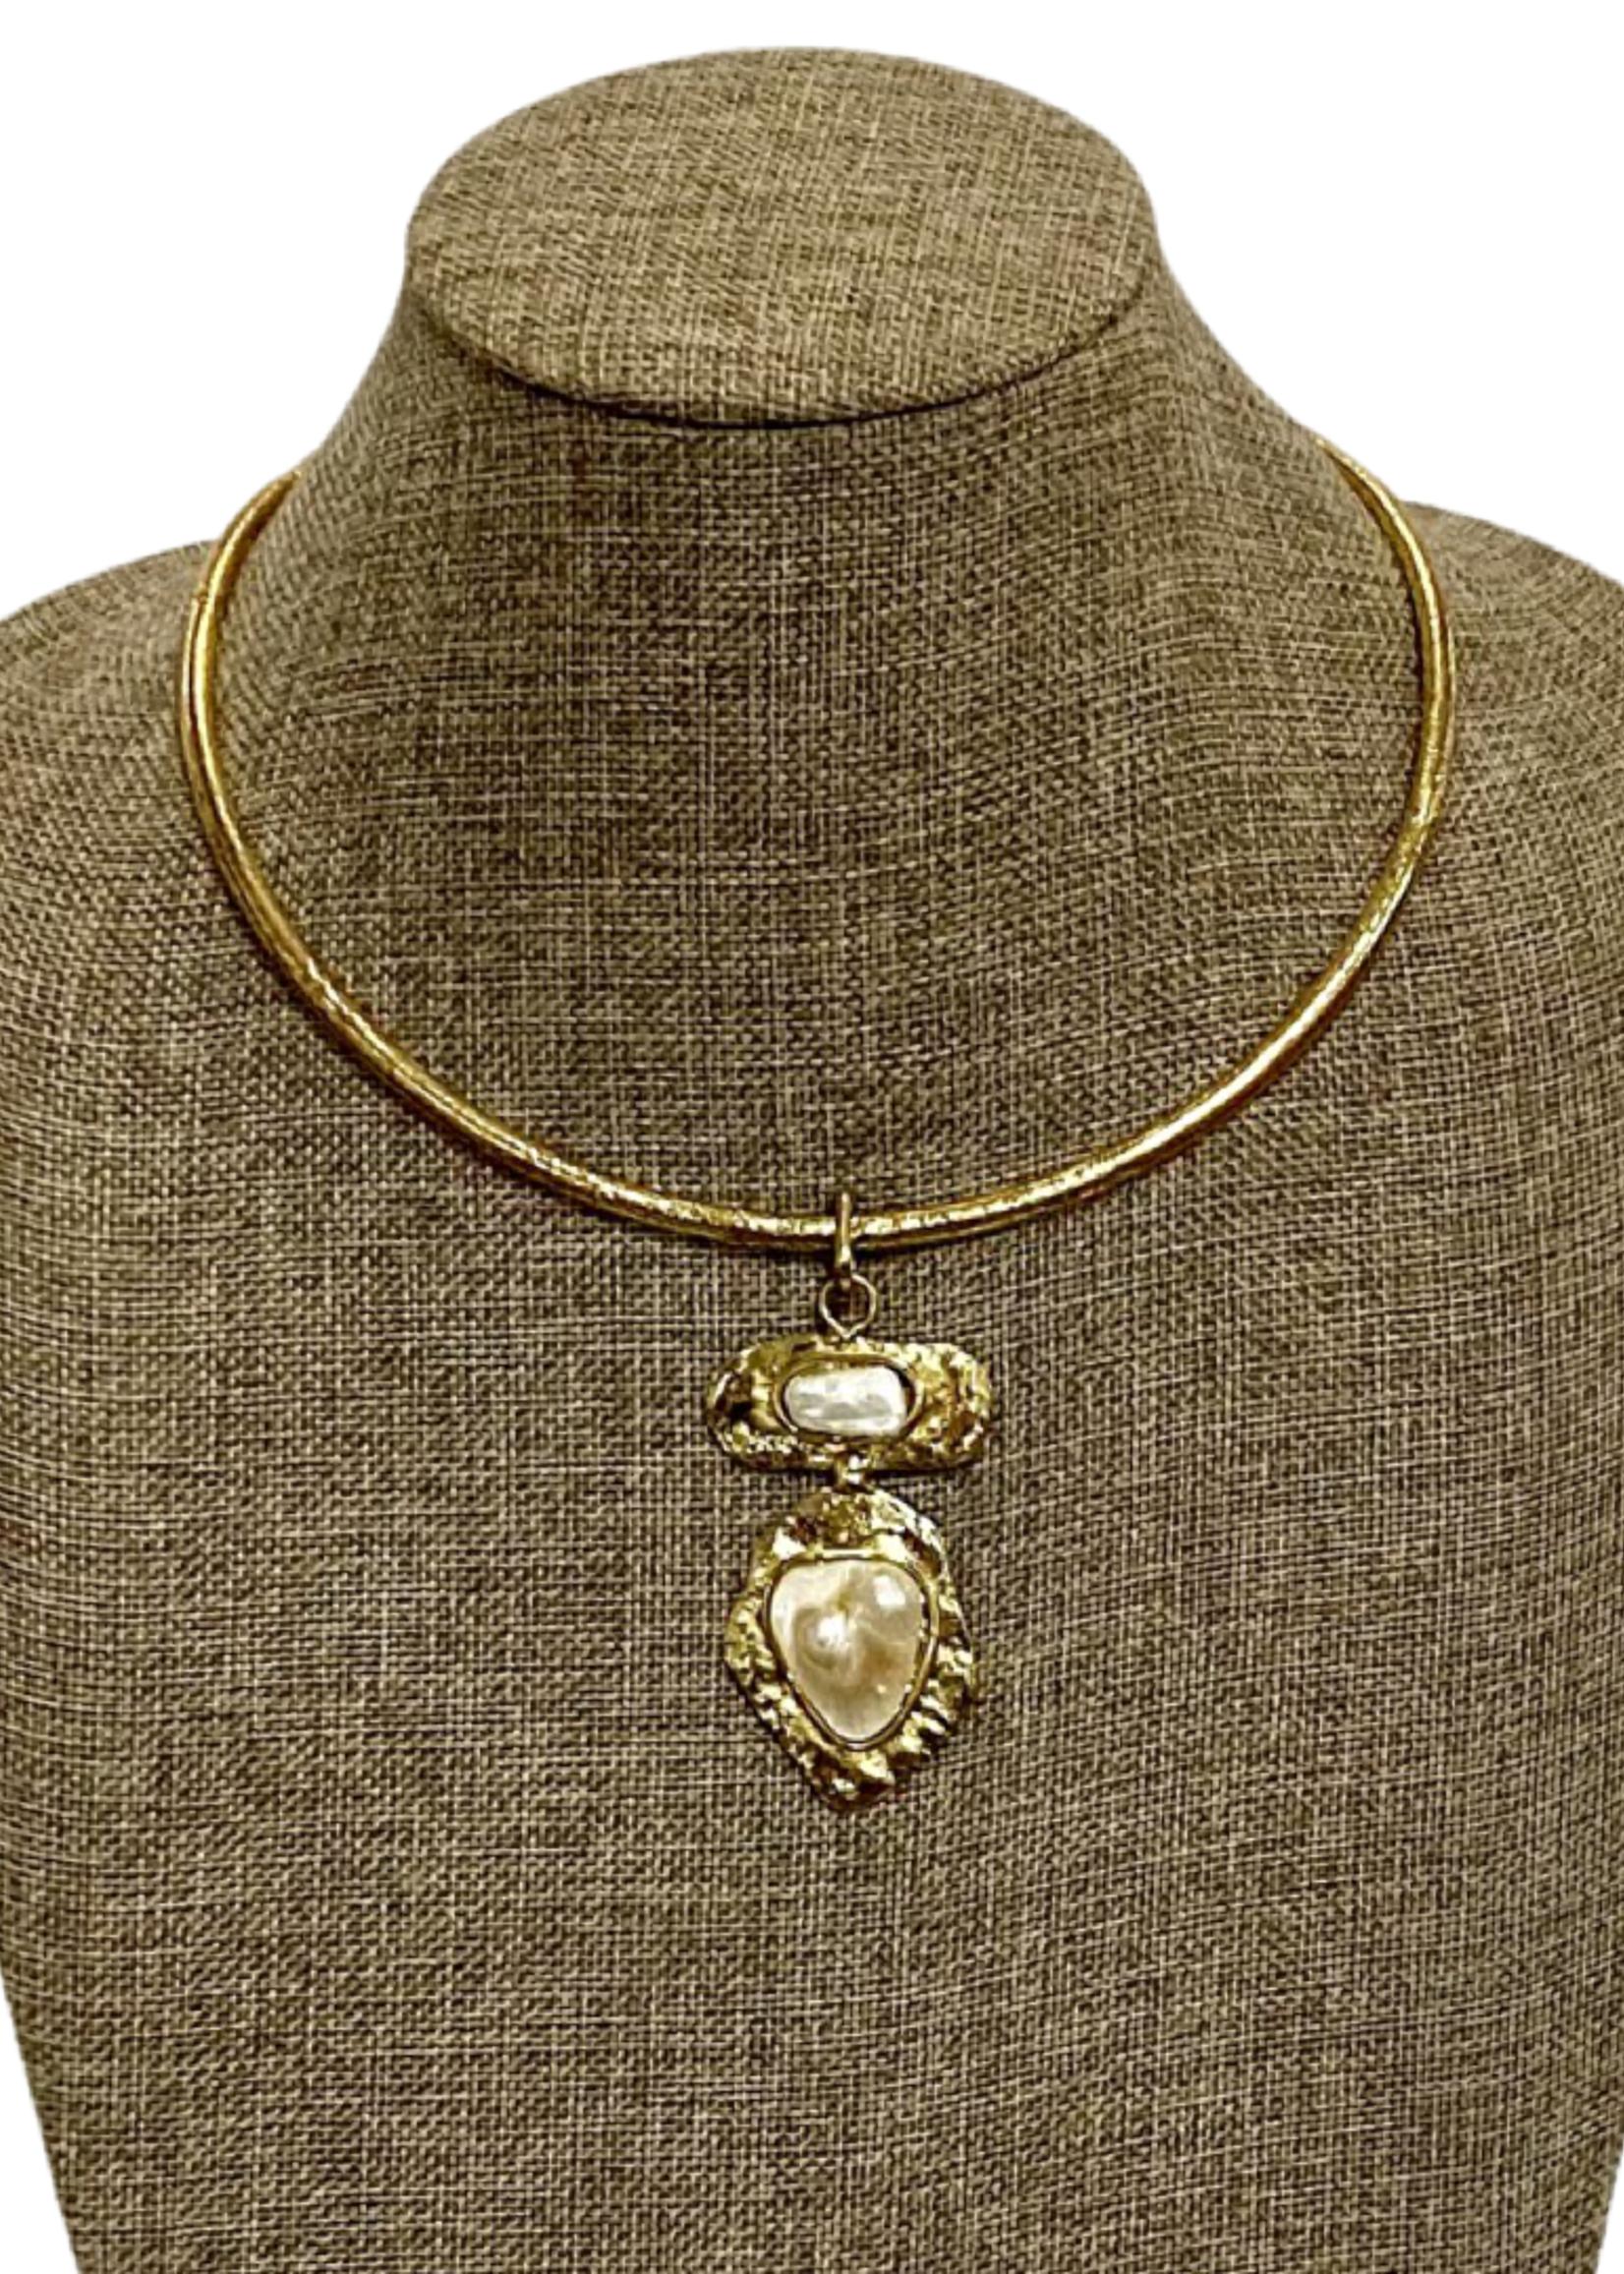 David Jeffery Pendant Gold White Metal & Copper Beva Pearl